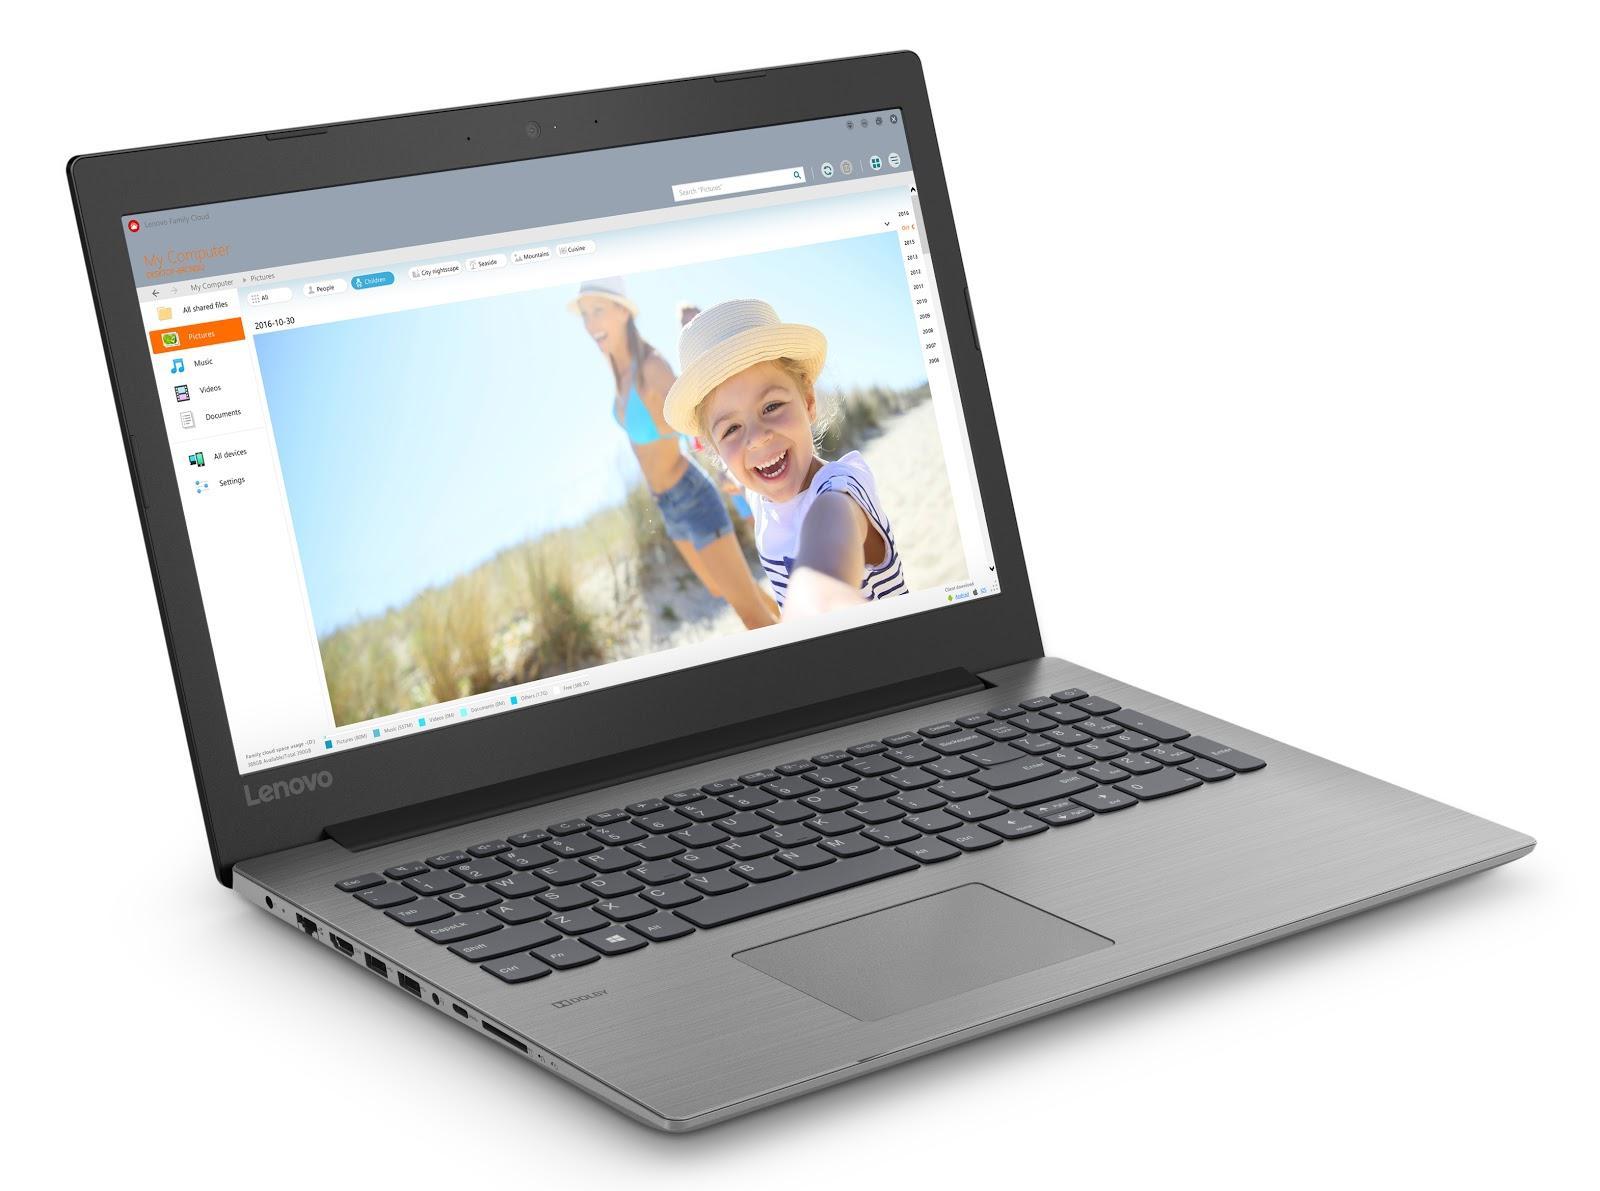 Фото 2. Ноутбук Lenovo ideapad 330-15 Onyx Black (81DE01VPRA)